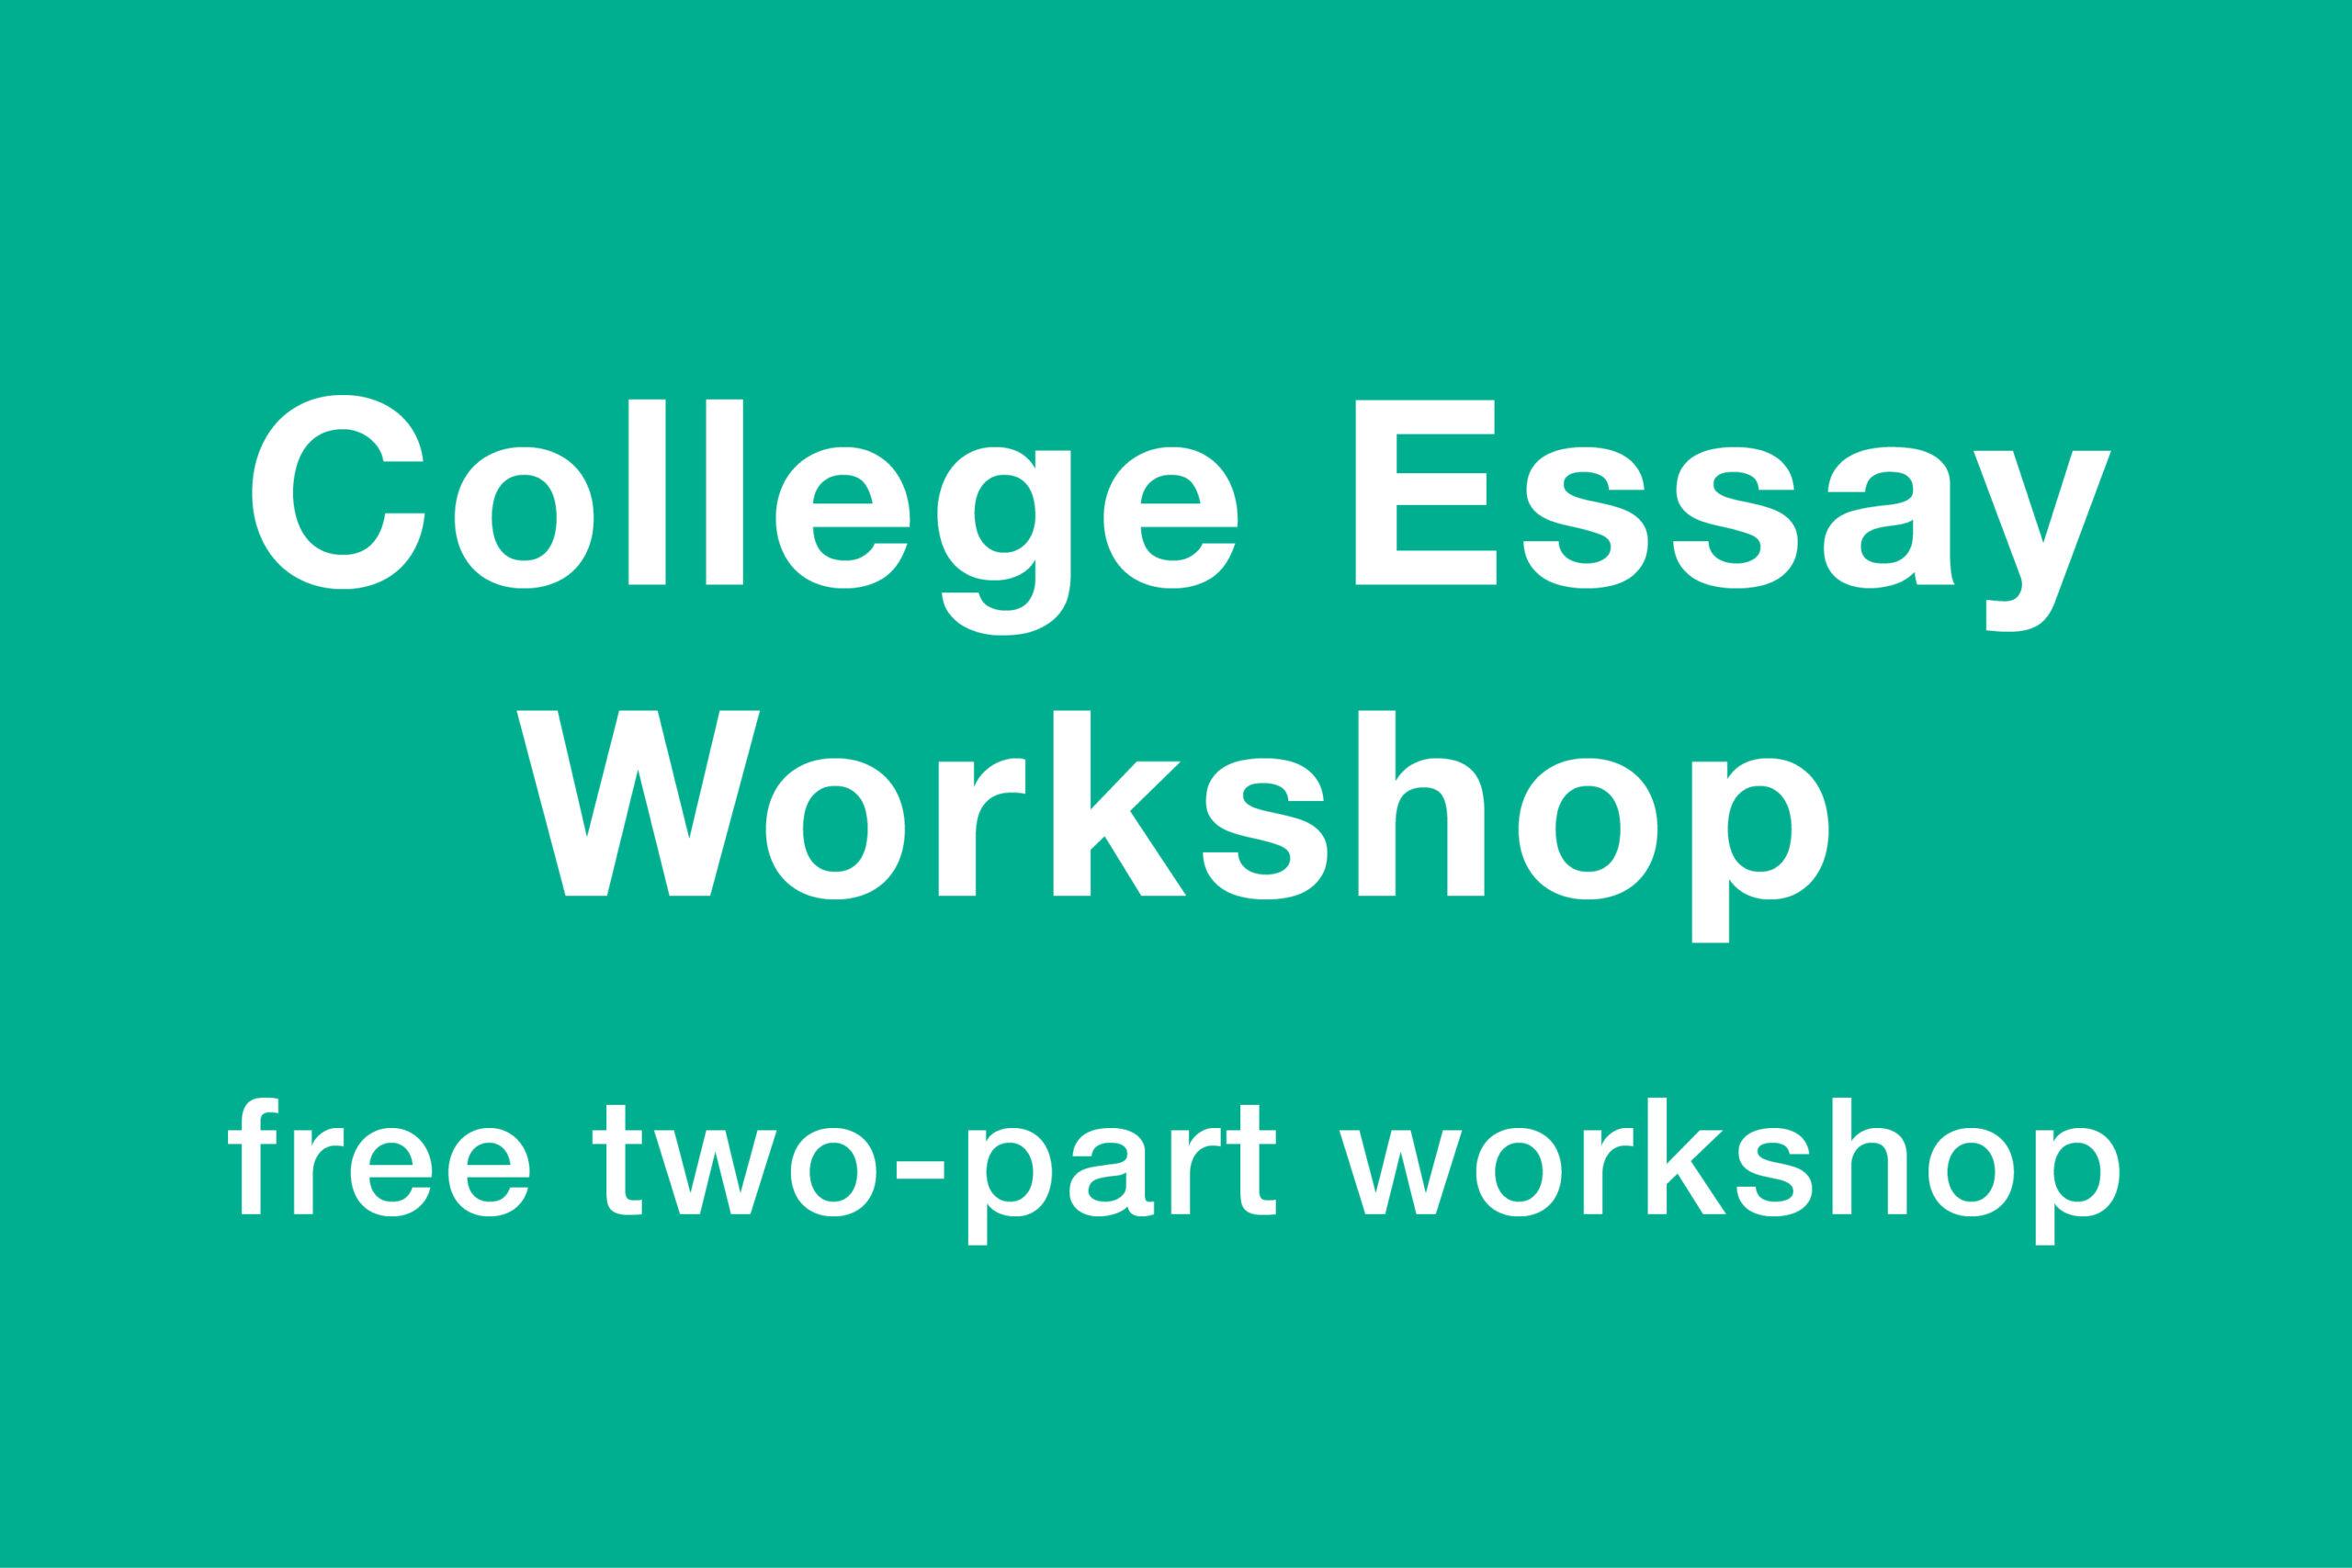 College essay workshop: free two-part workshop